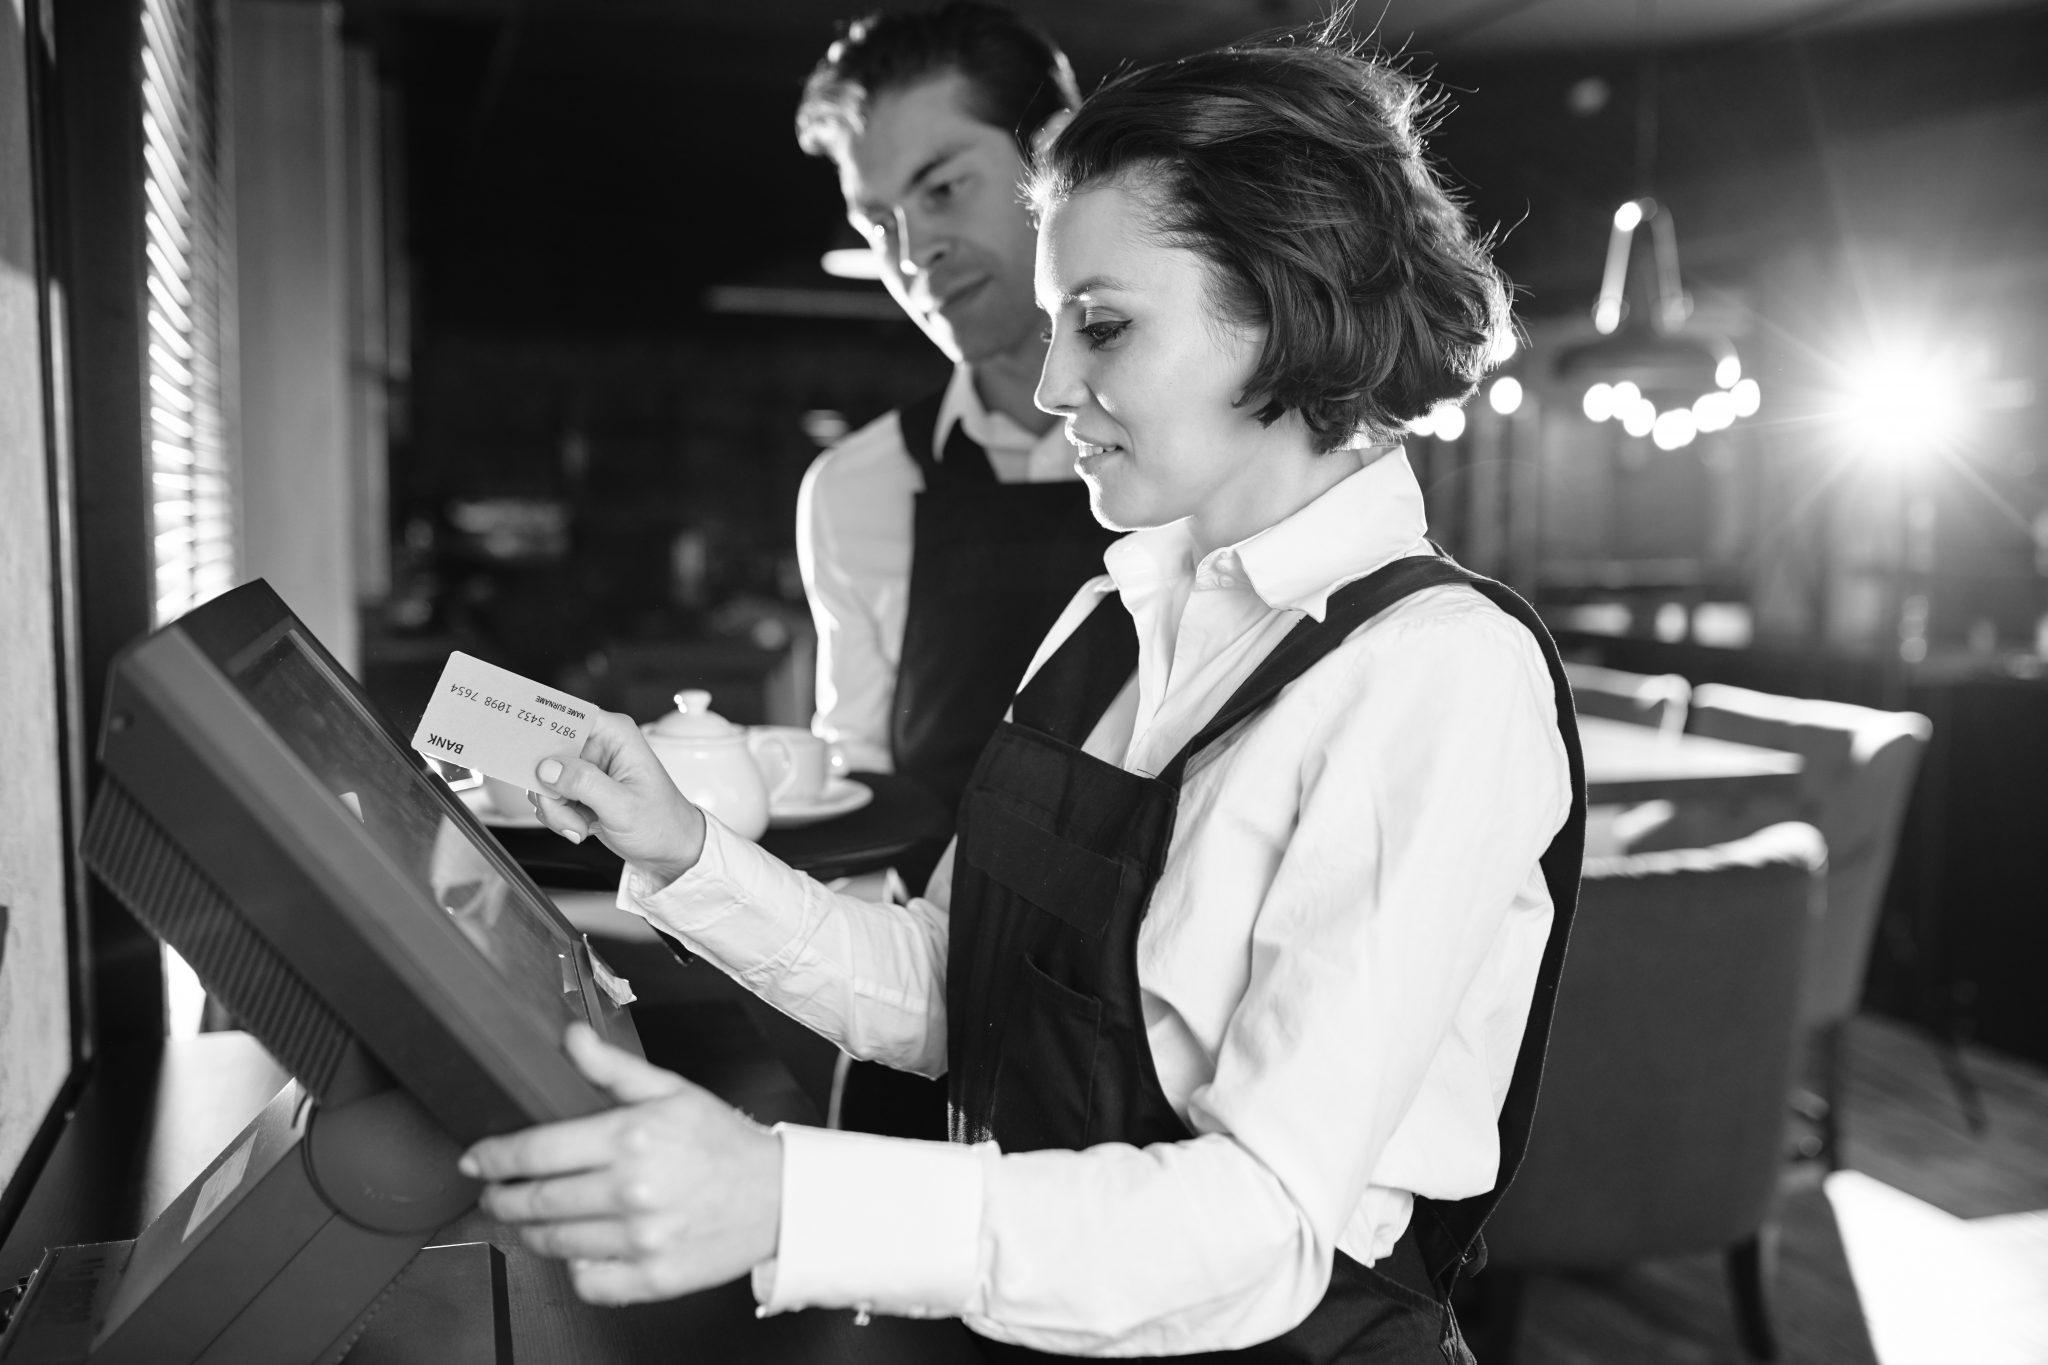 Image of waitress using POS terminal